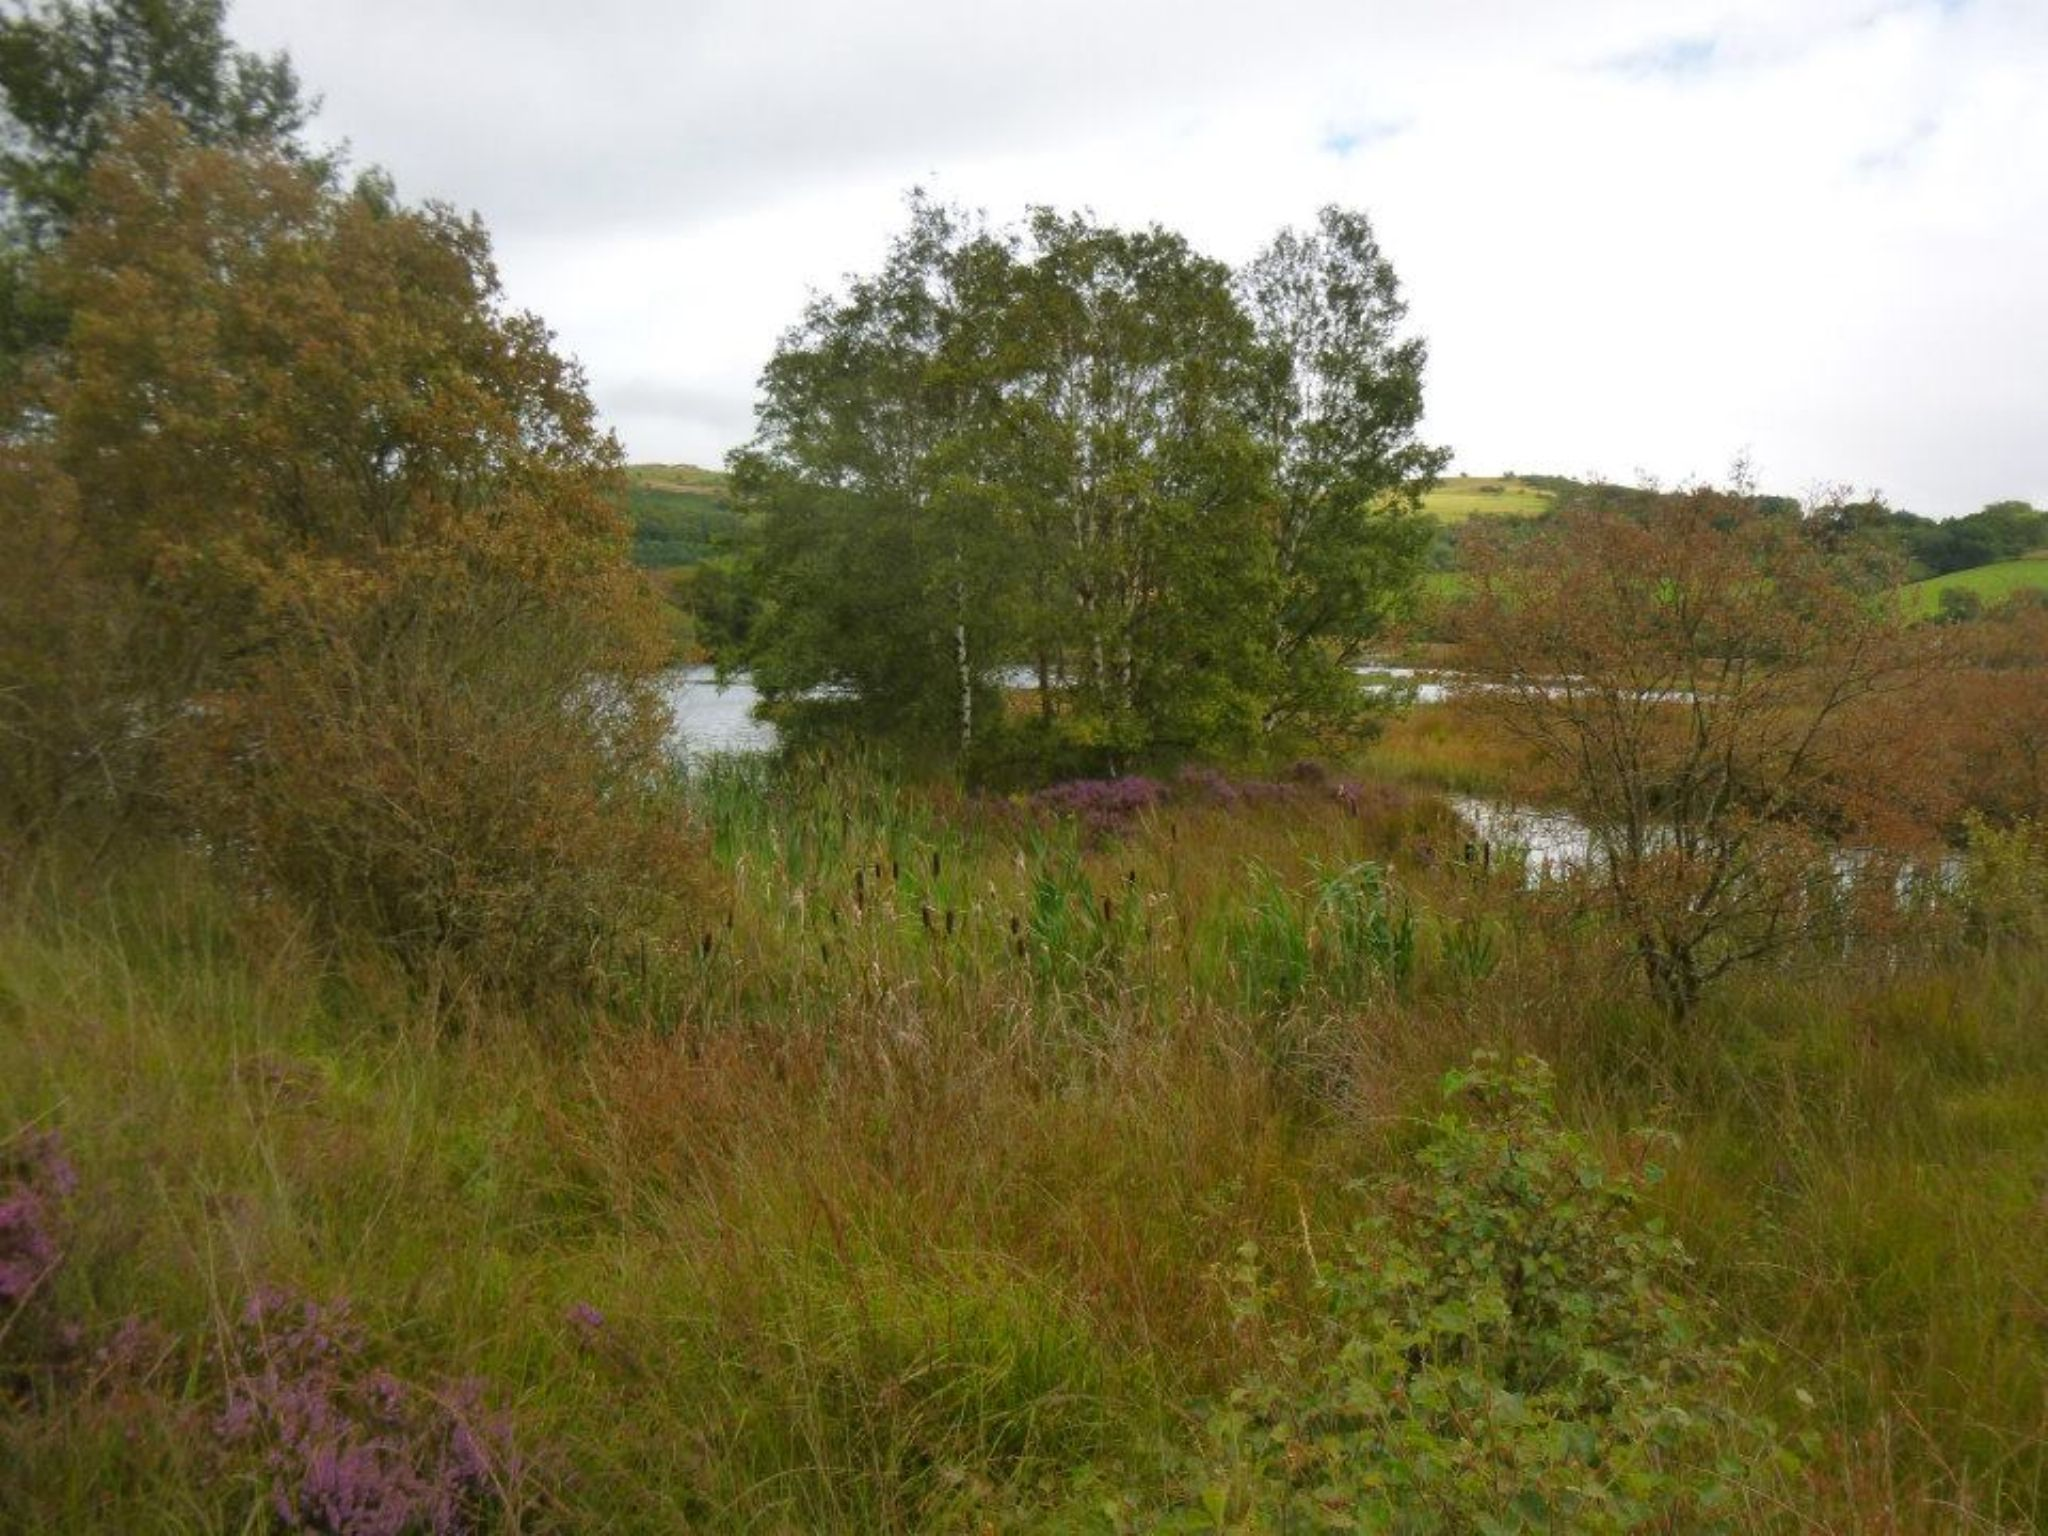 cors caron  (tregaron bog) by chris.adams.3557